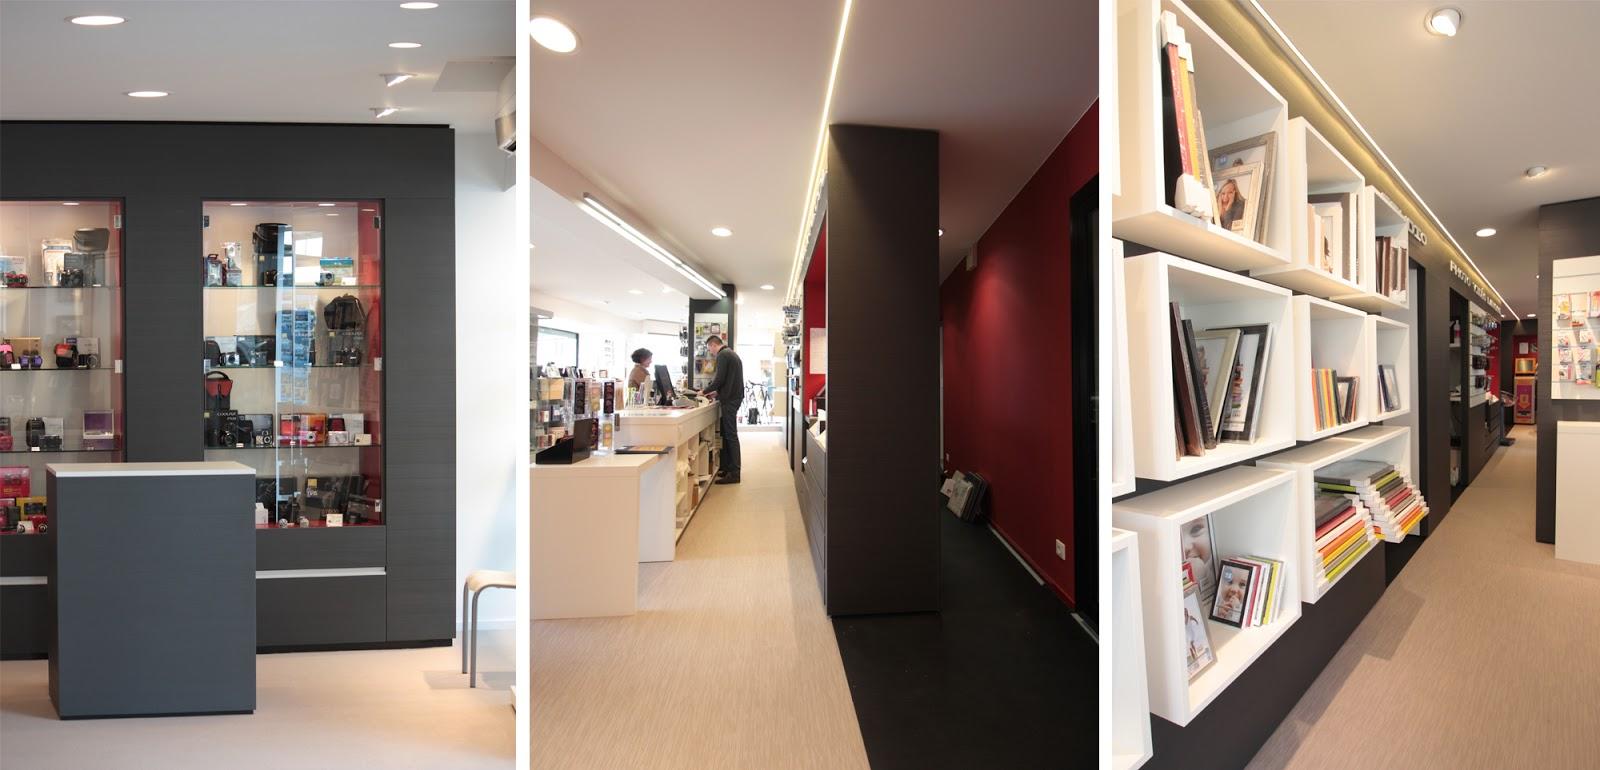 a l 39 ouest photo vid o larnicol pont l 39 abb. Black Bedroom Furniture Sets. Home Design Ideas